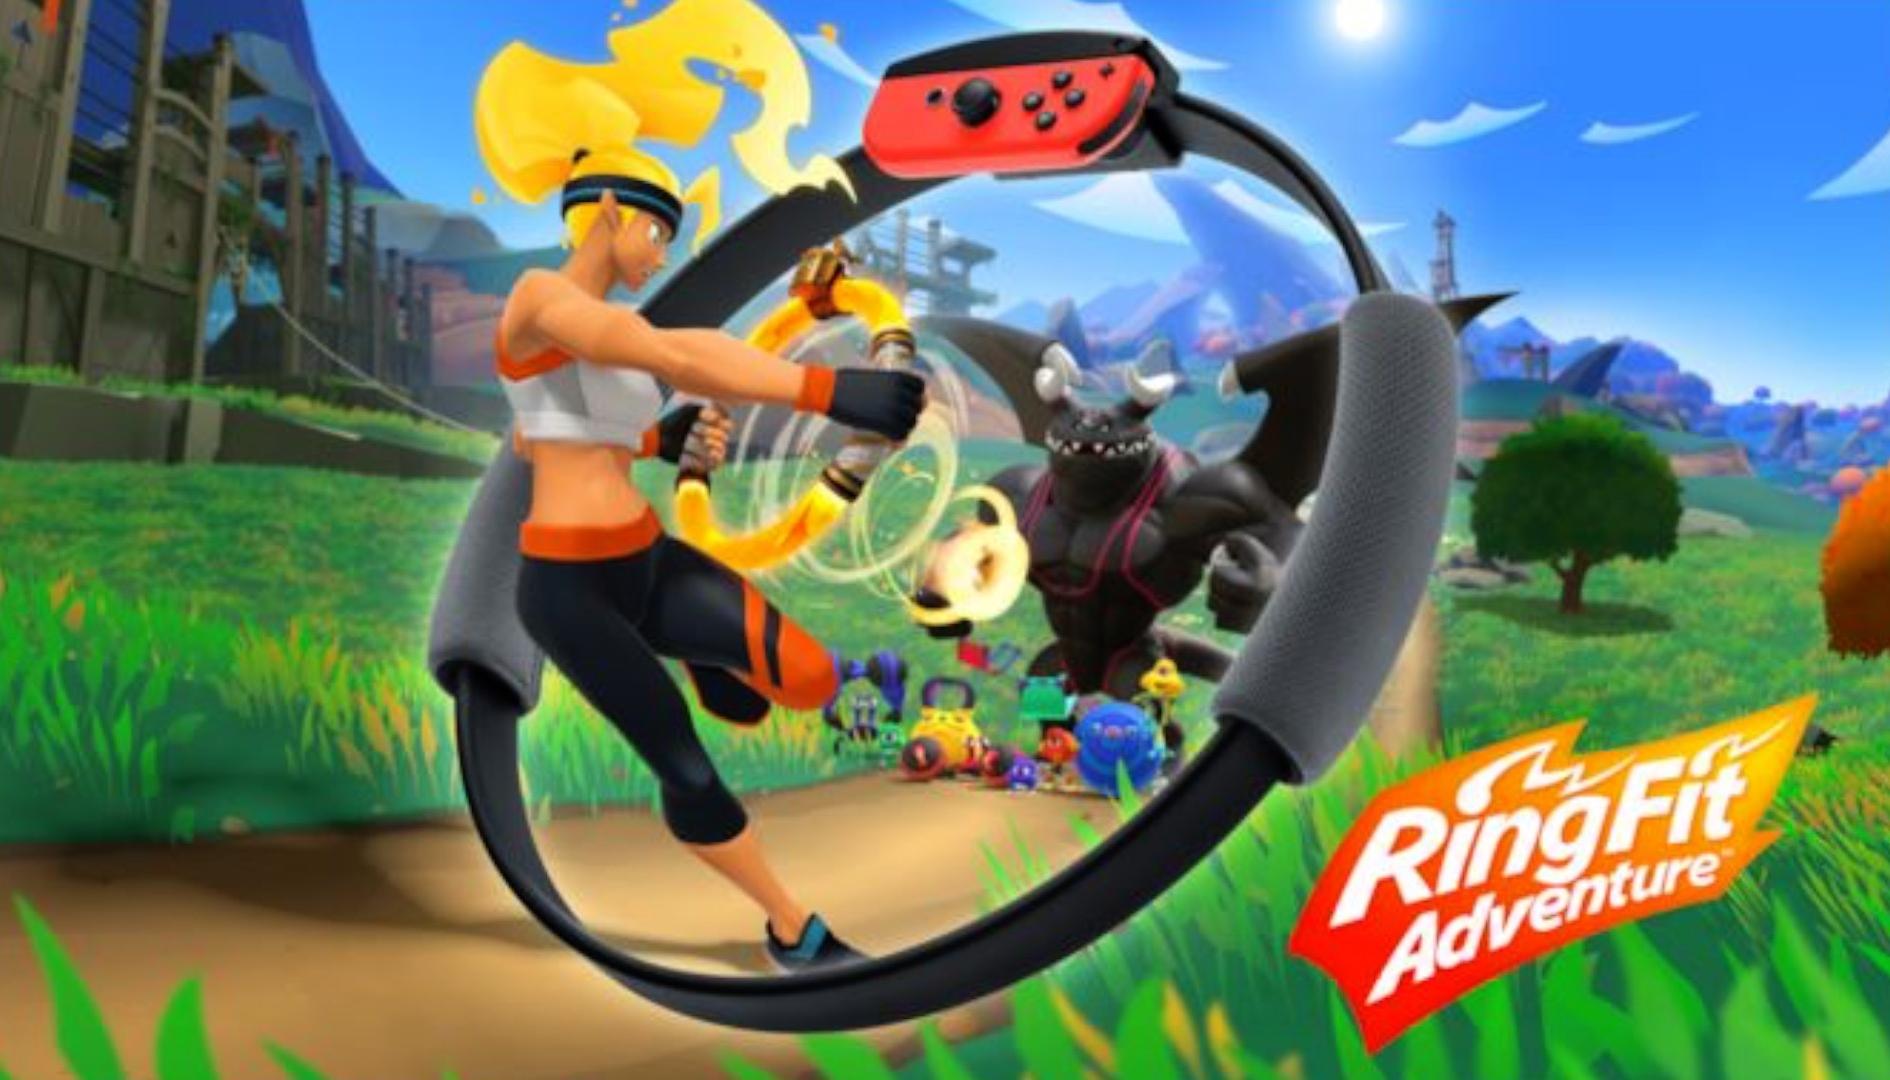 Ring Fit Adventure è stato tra i giochi più venduti a ottobre in Giappone